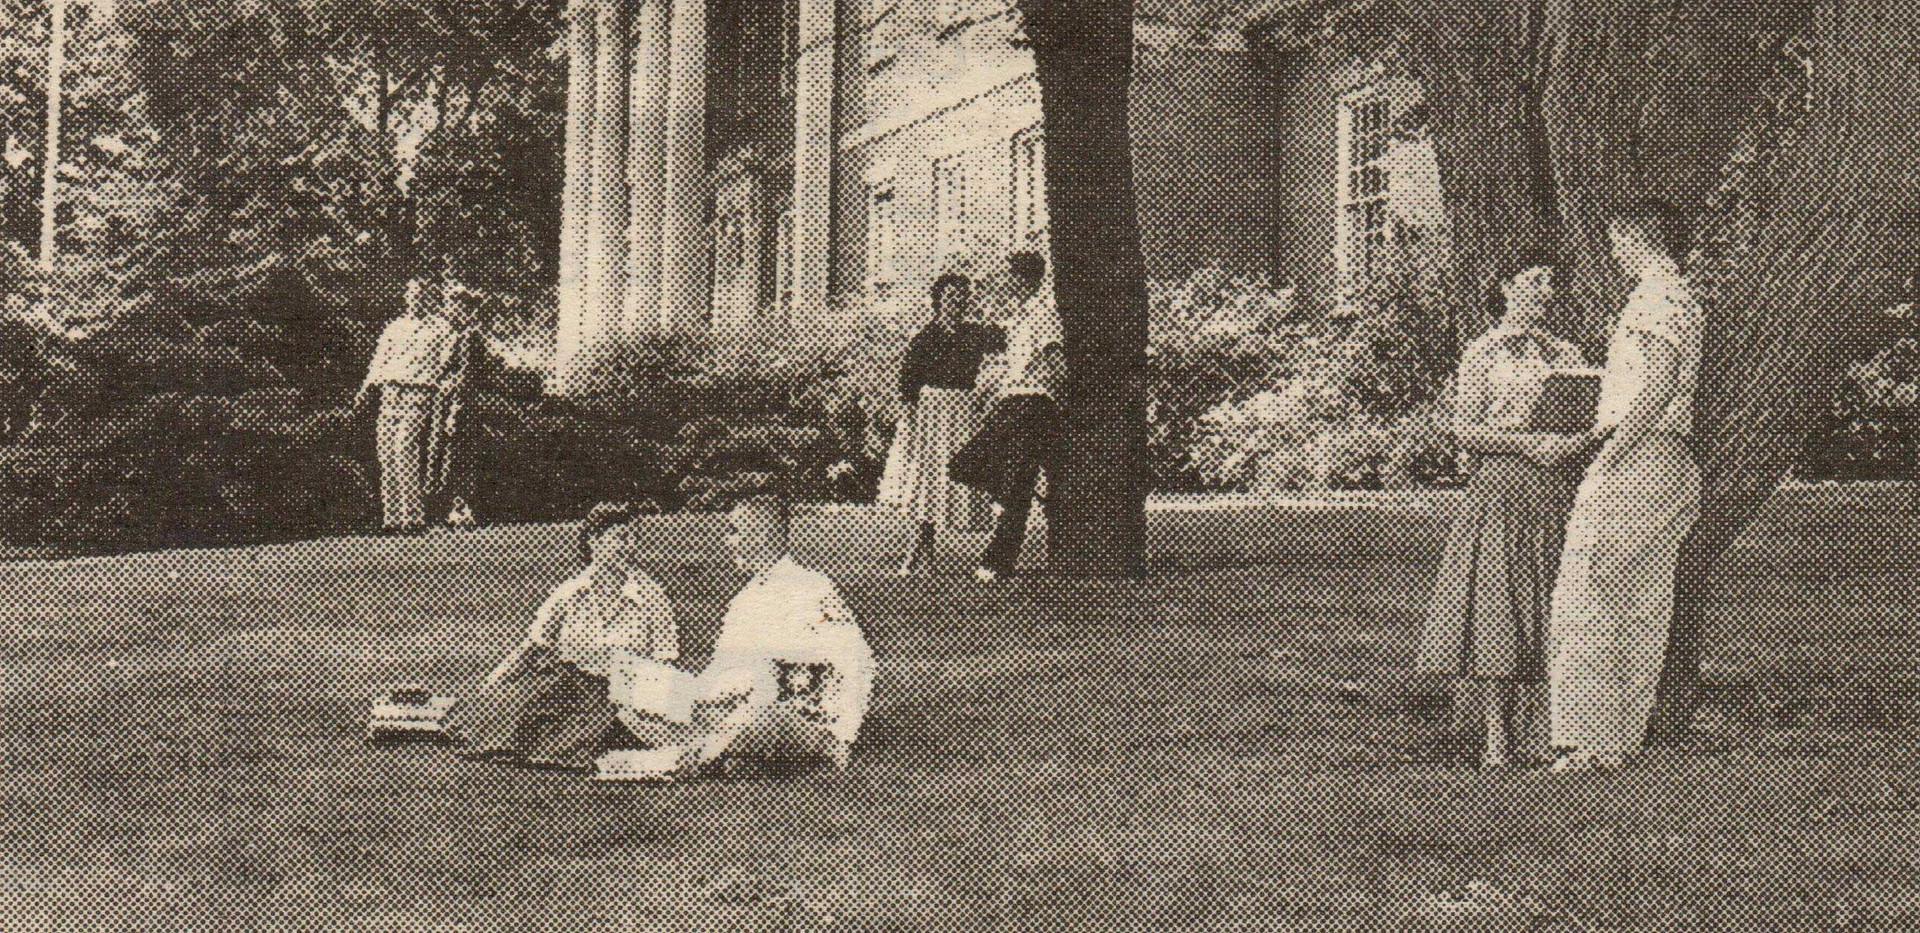 Memorial_Hall_1957.jpg